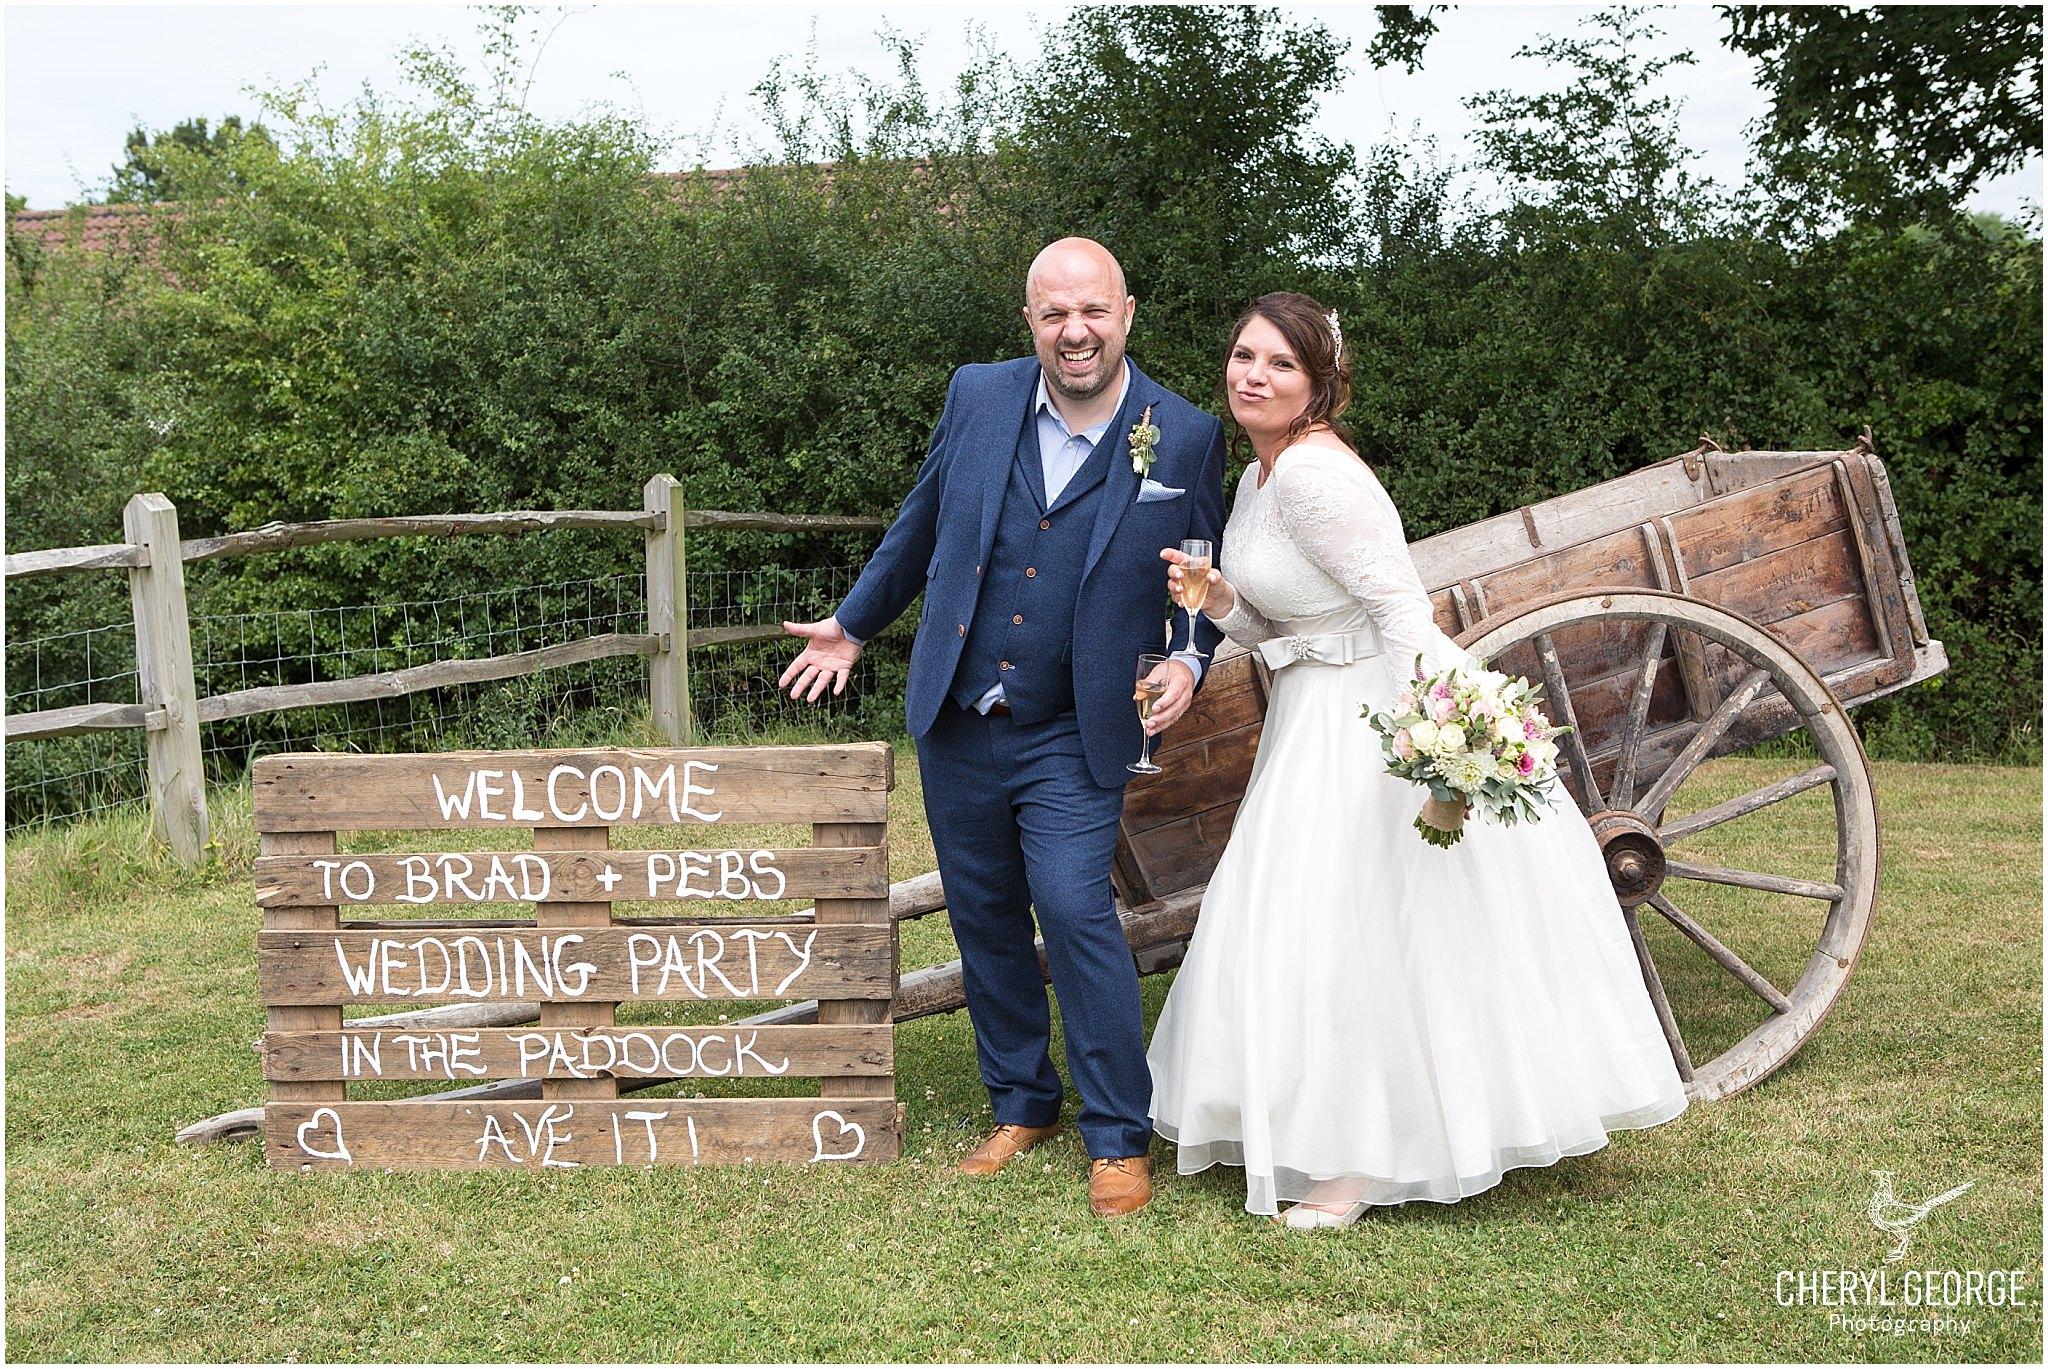 Pebble & Brad's Gildings Barn wedding